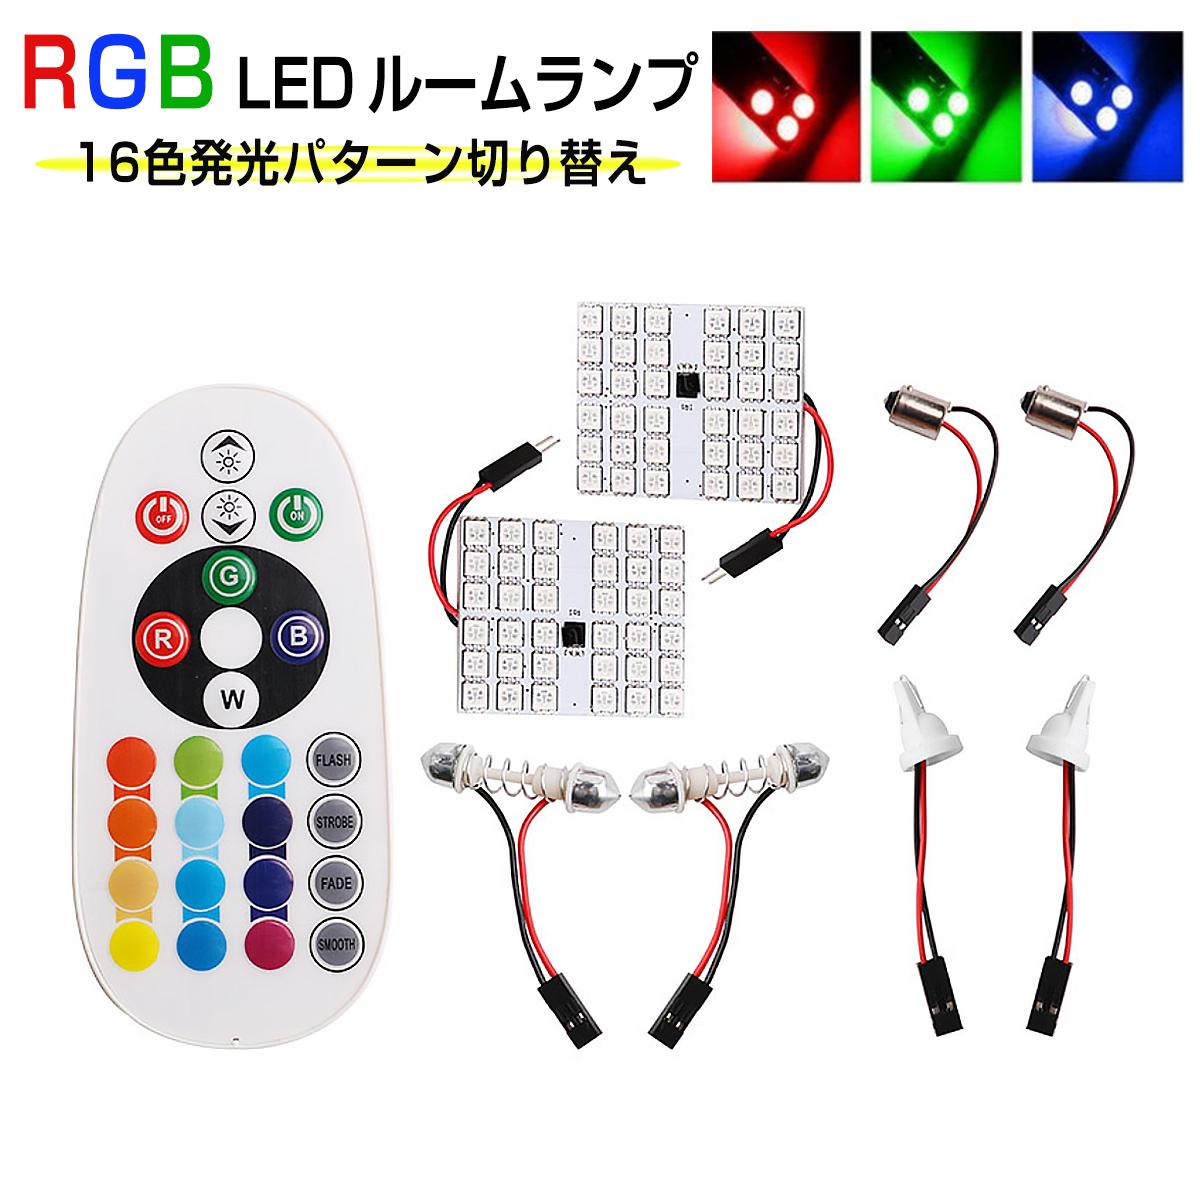 LED RGB 36SMD LED ルームランプ 16色 T10 BA9S(G14 T8.5) T10×31 T8x28(S8.5)コネクタ付 5050チップ SDM便送料無料 在庫処分1ヶ月保証